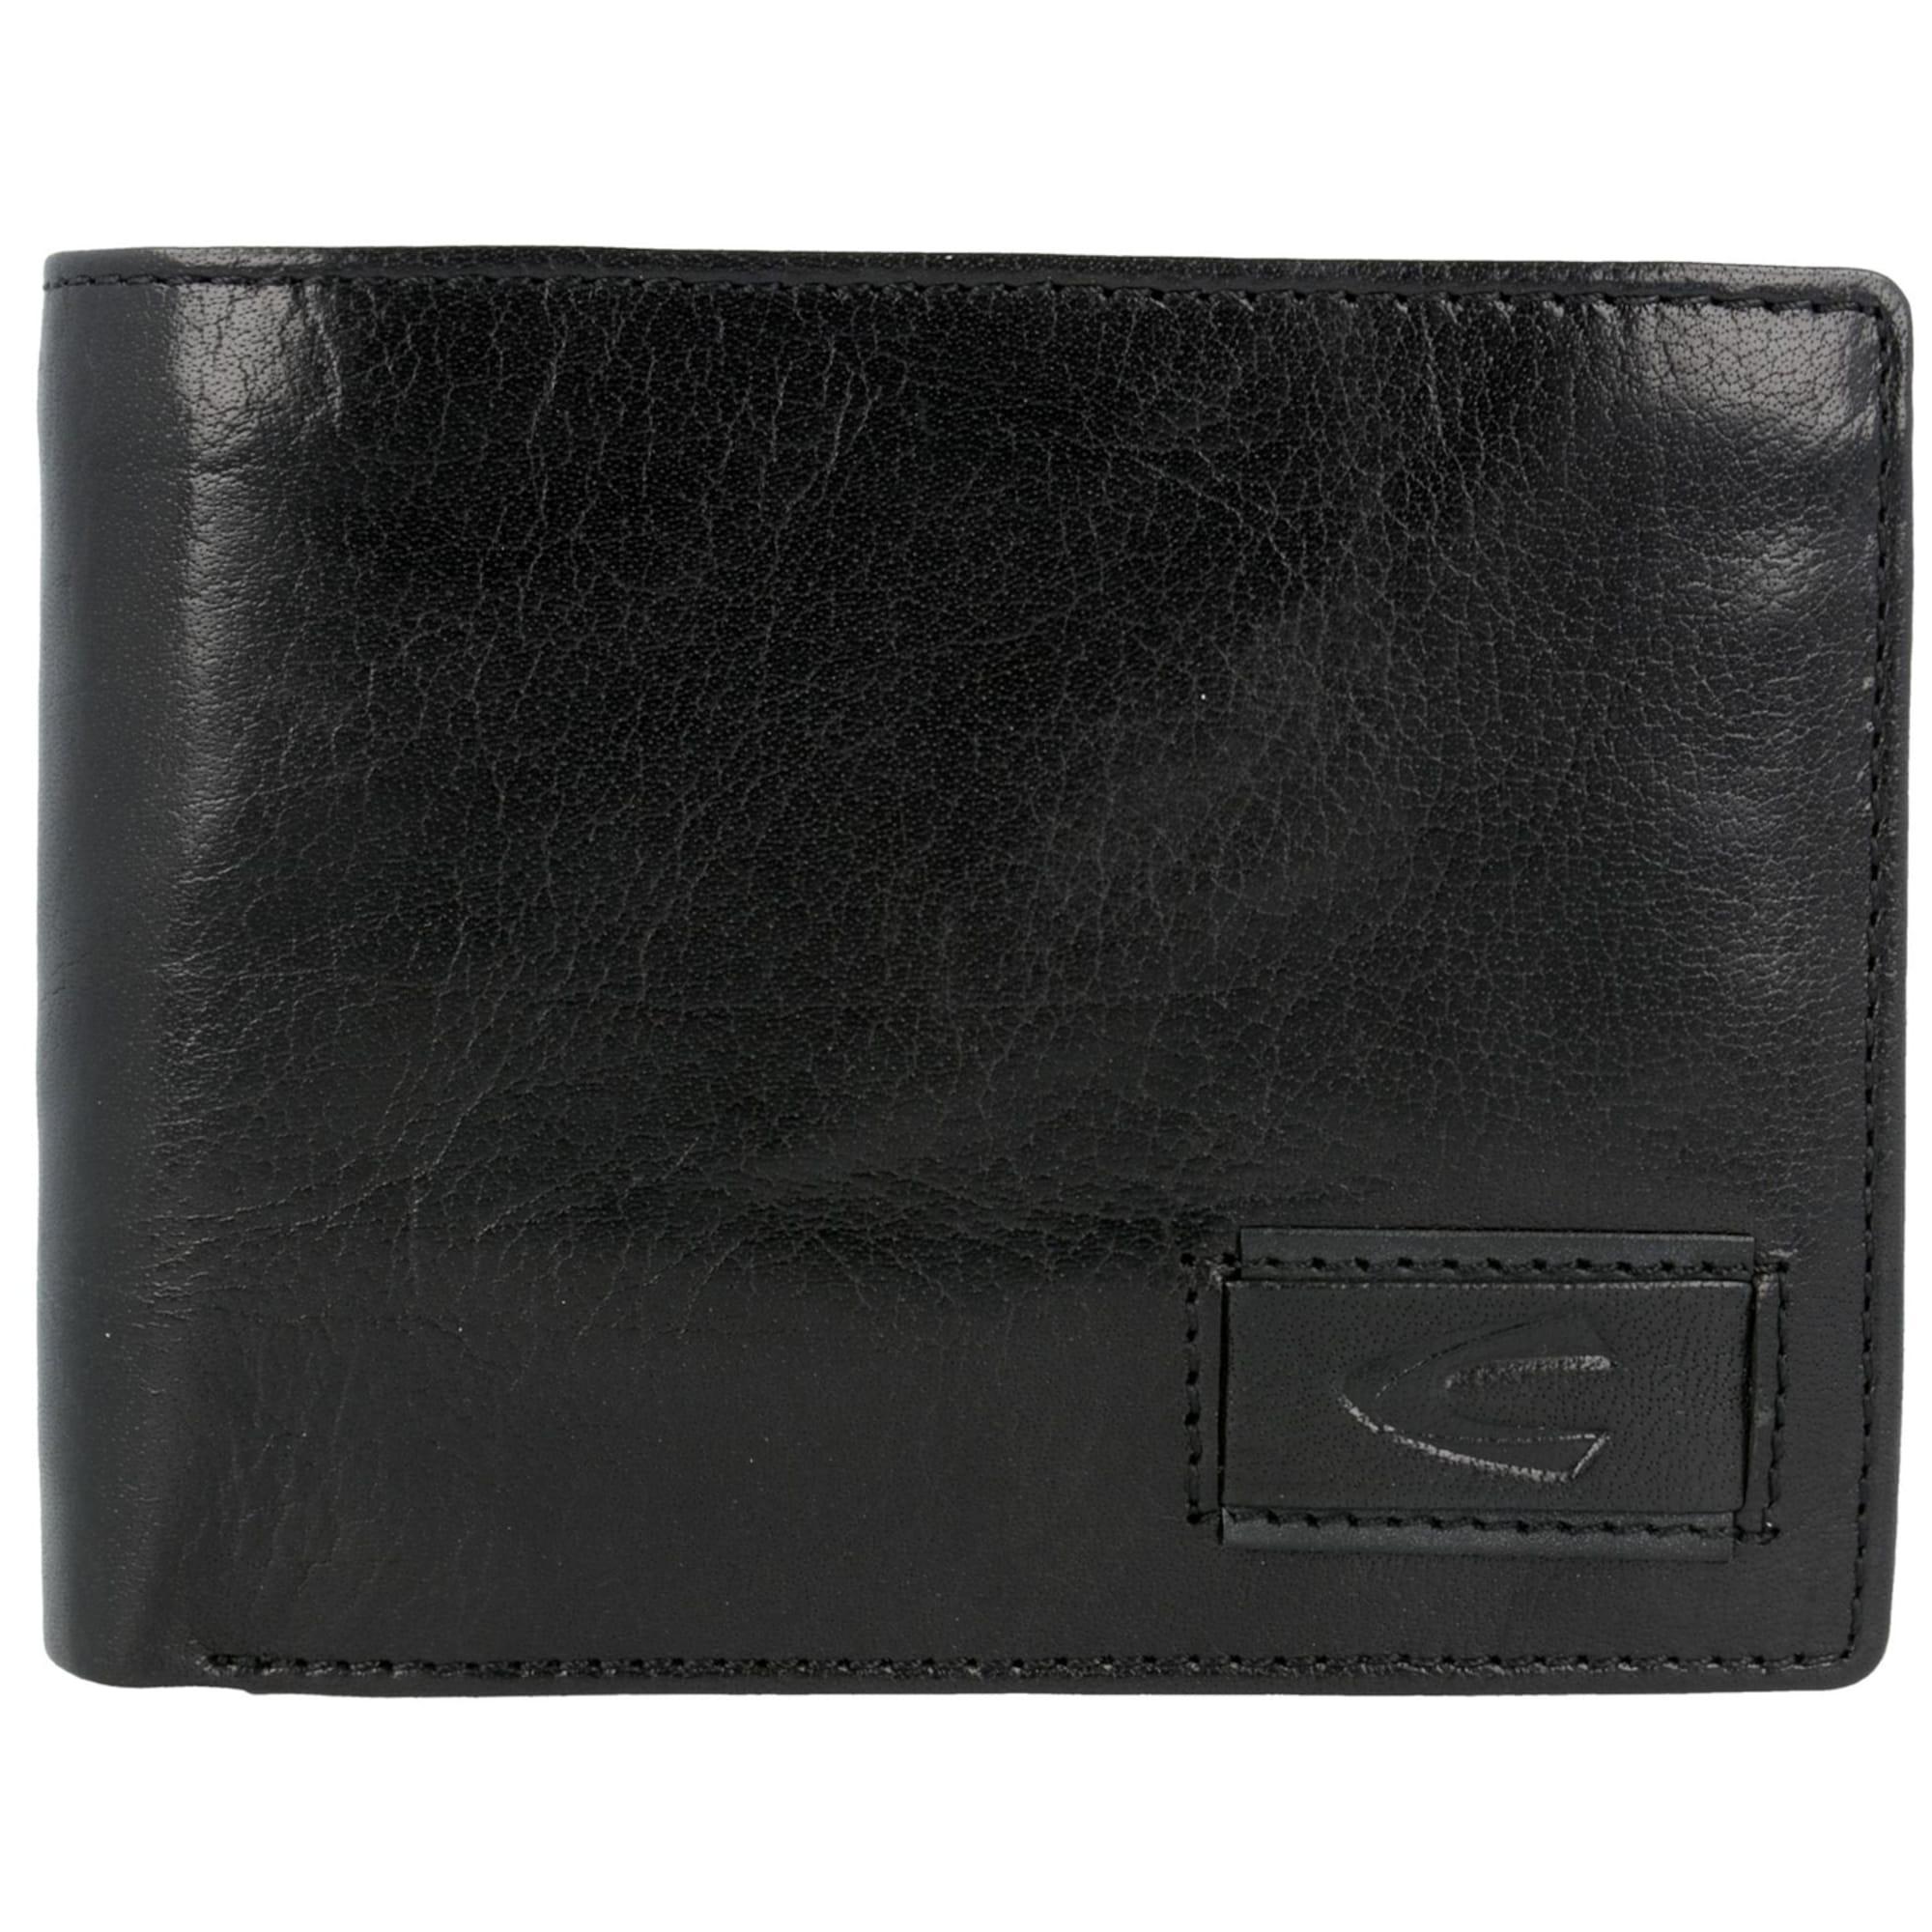 Geldbörse 'Panama', Leder, 12,5 cm | Accessoires > Portemonnaies > Geldbörsen | camel active